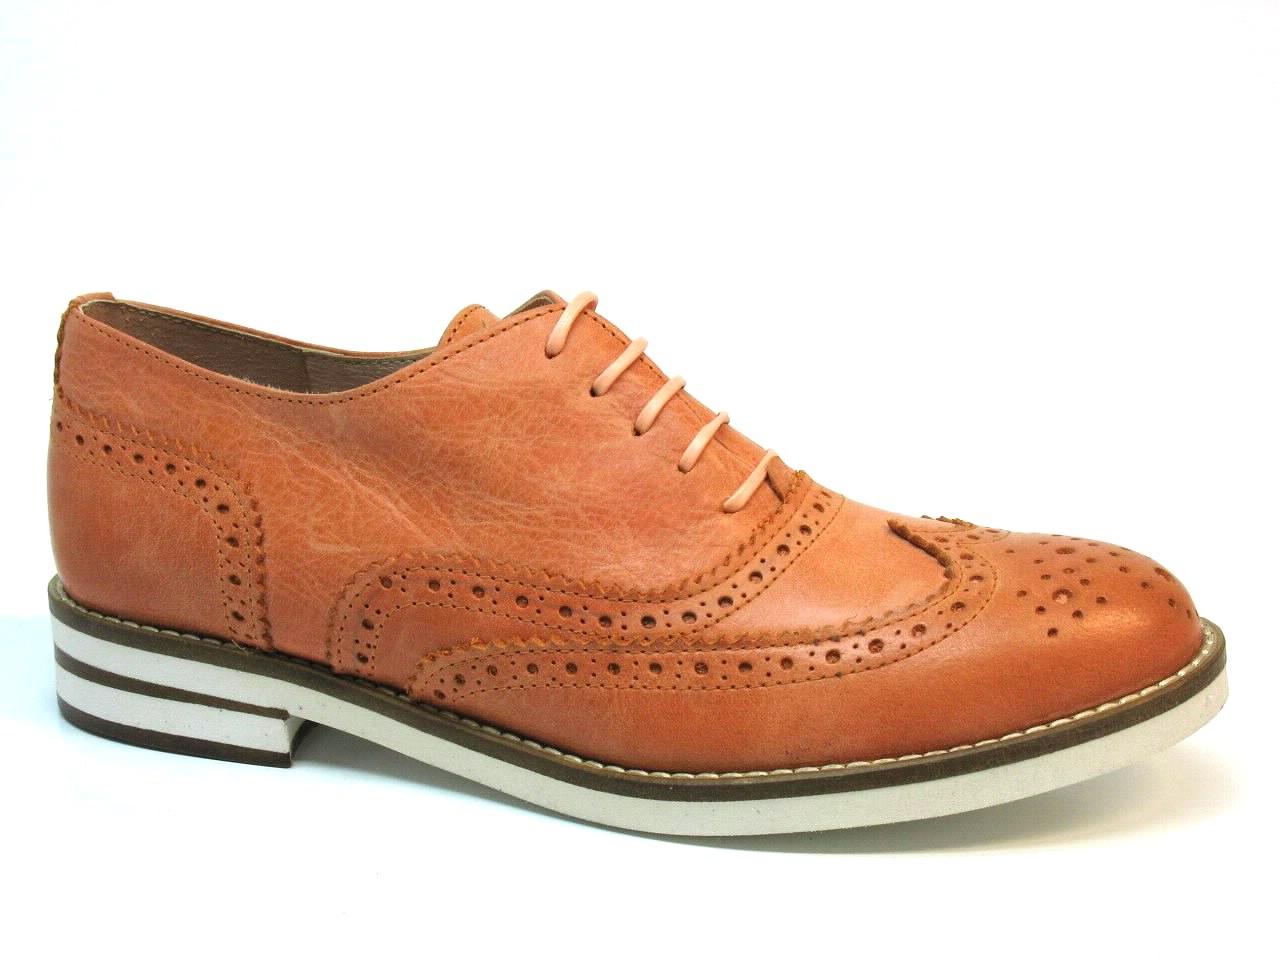 Chaussures Plates, Ballerine, Mocassins Sofia Costa - 085 6030